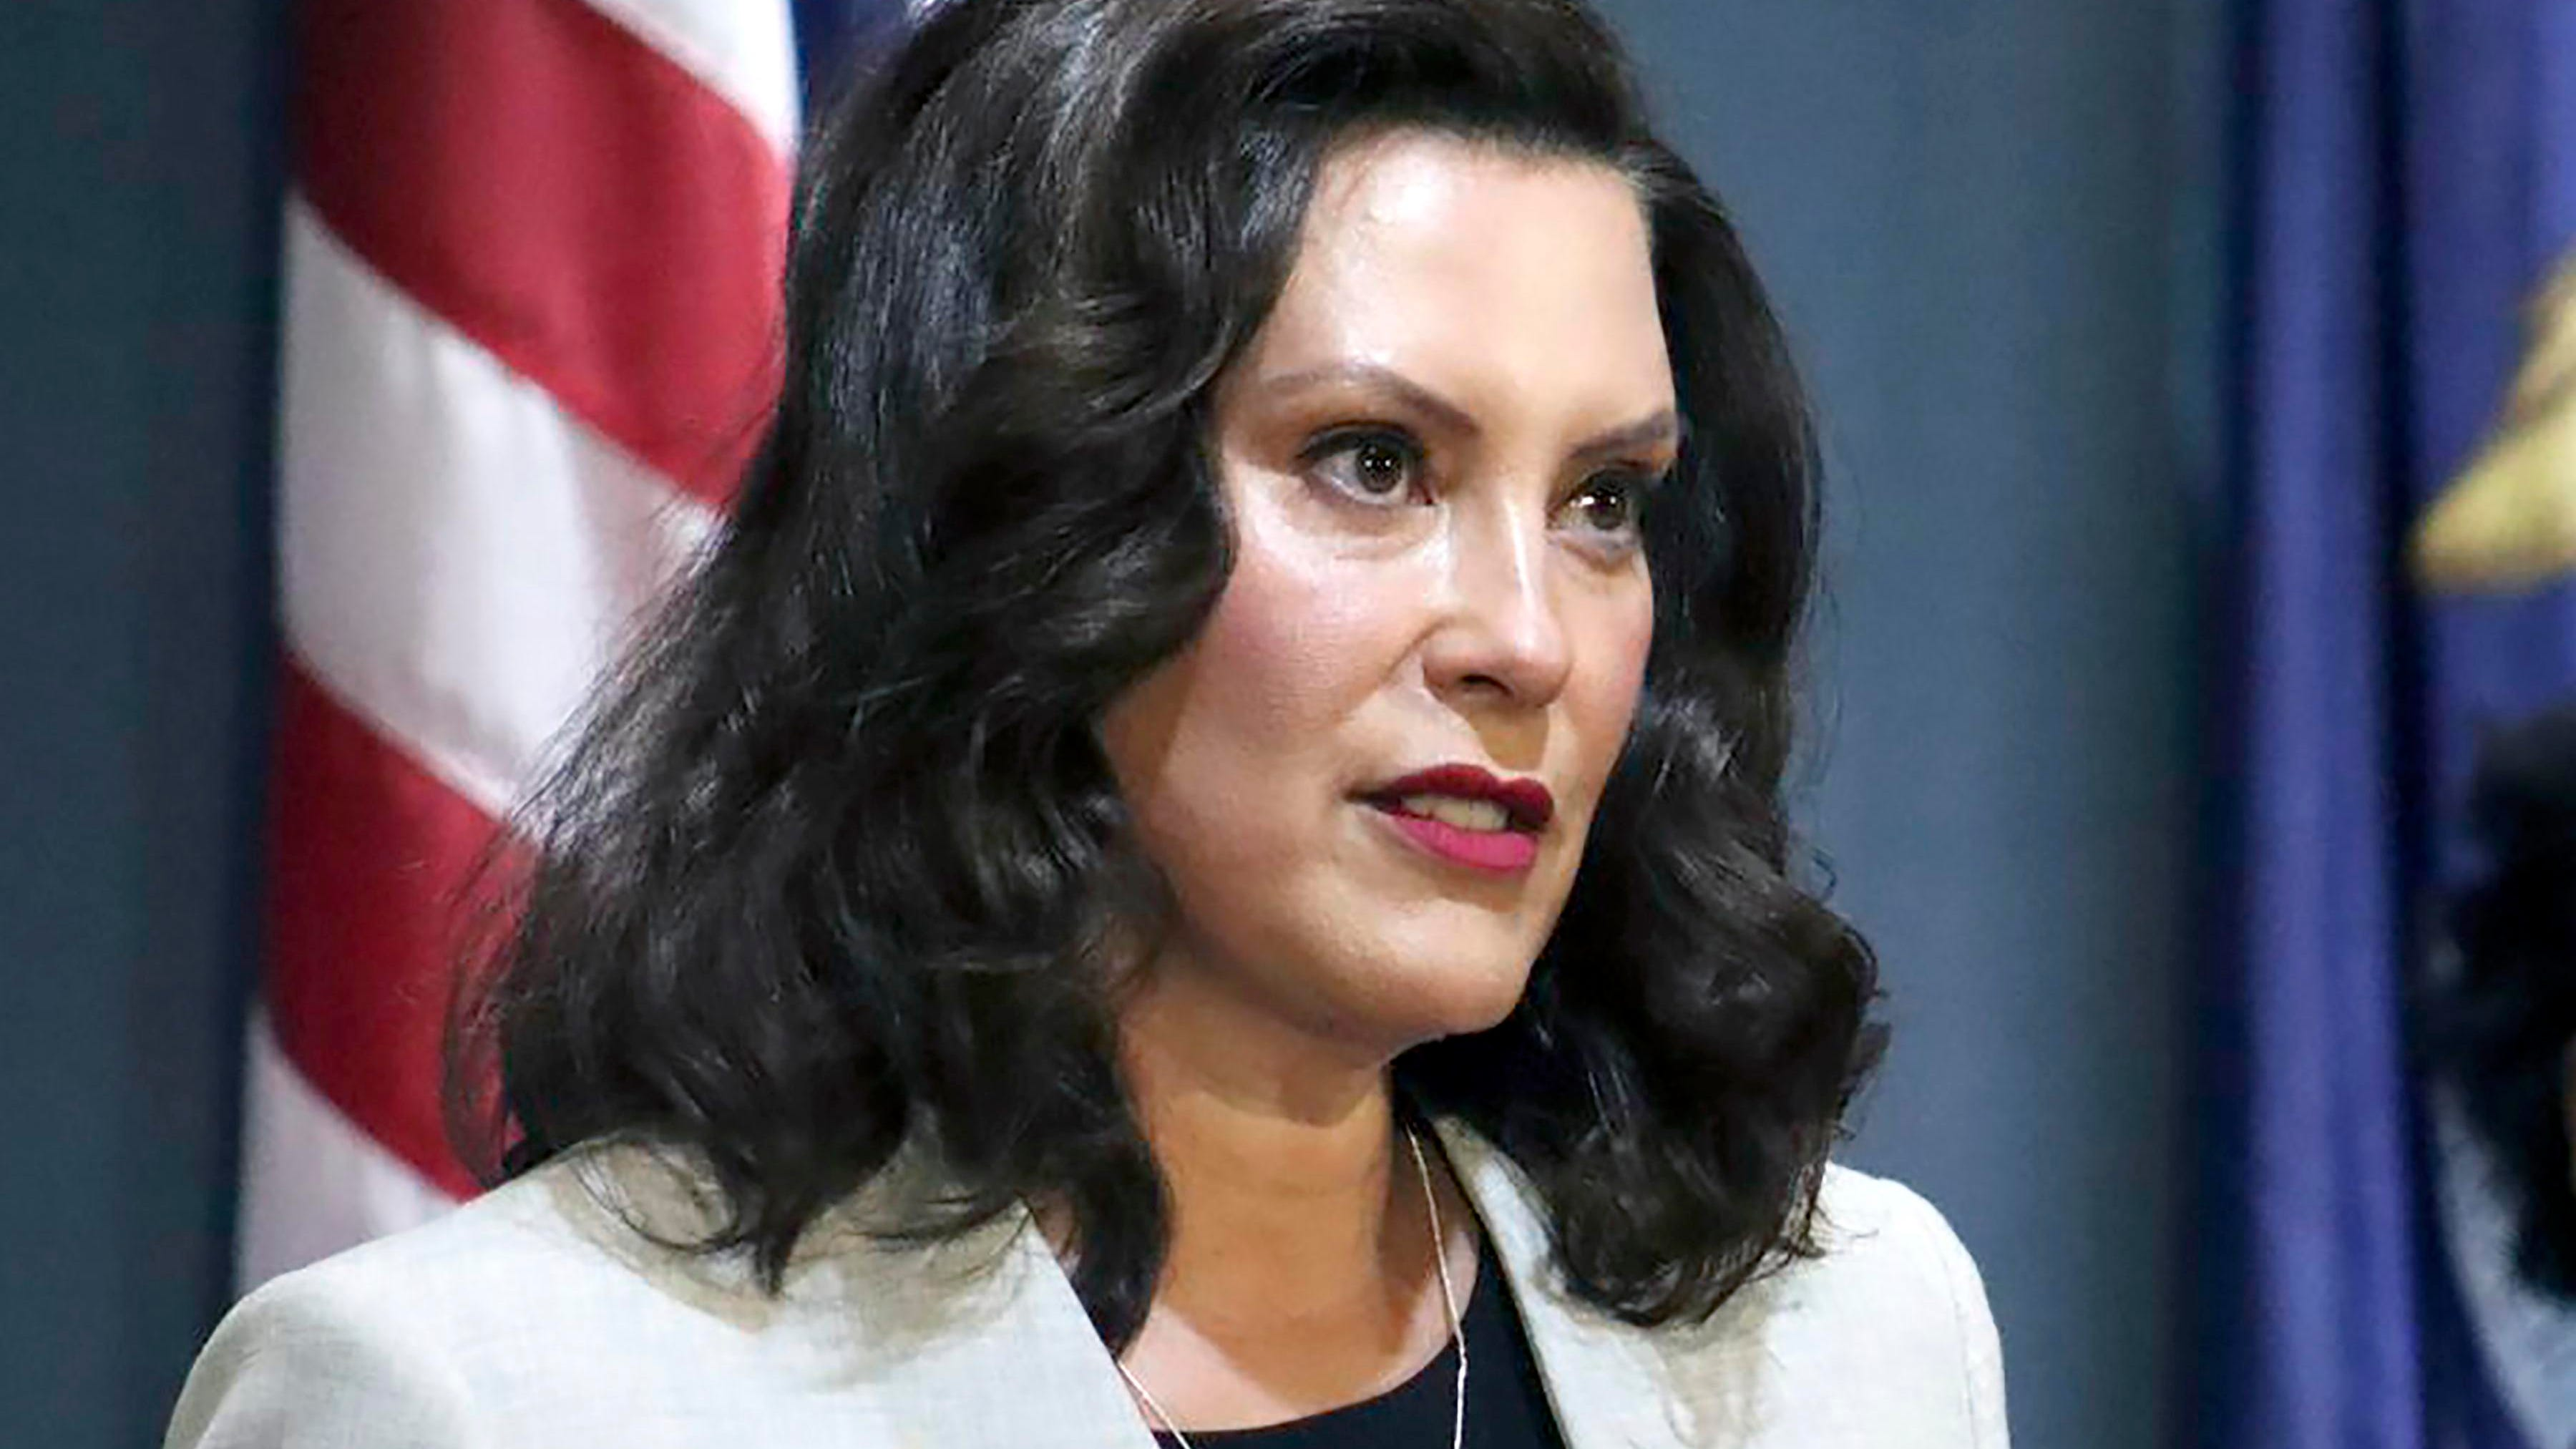 Why I M Suing Michigan Gov Gretchen Whitmer S Over Illegal Lockdown